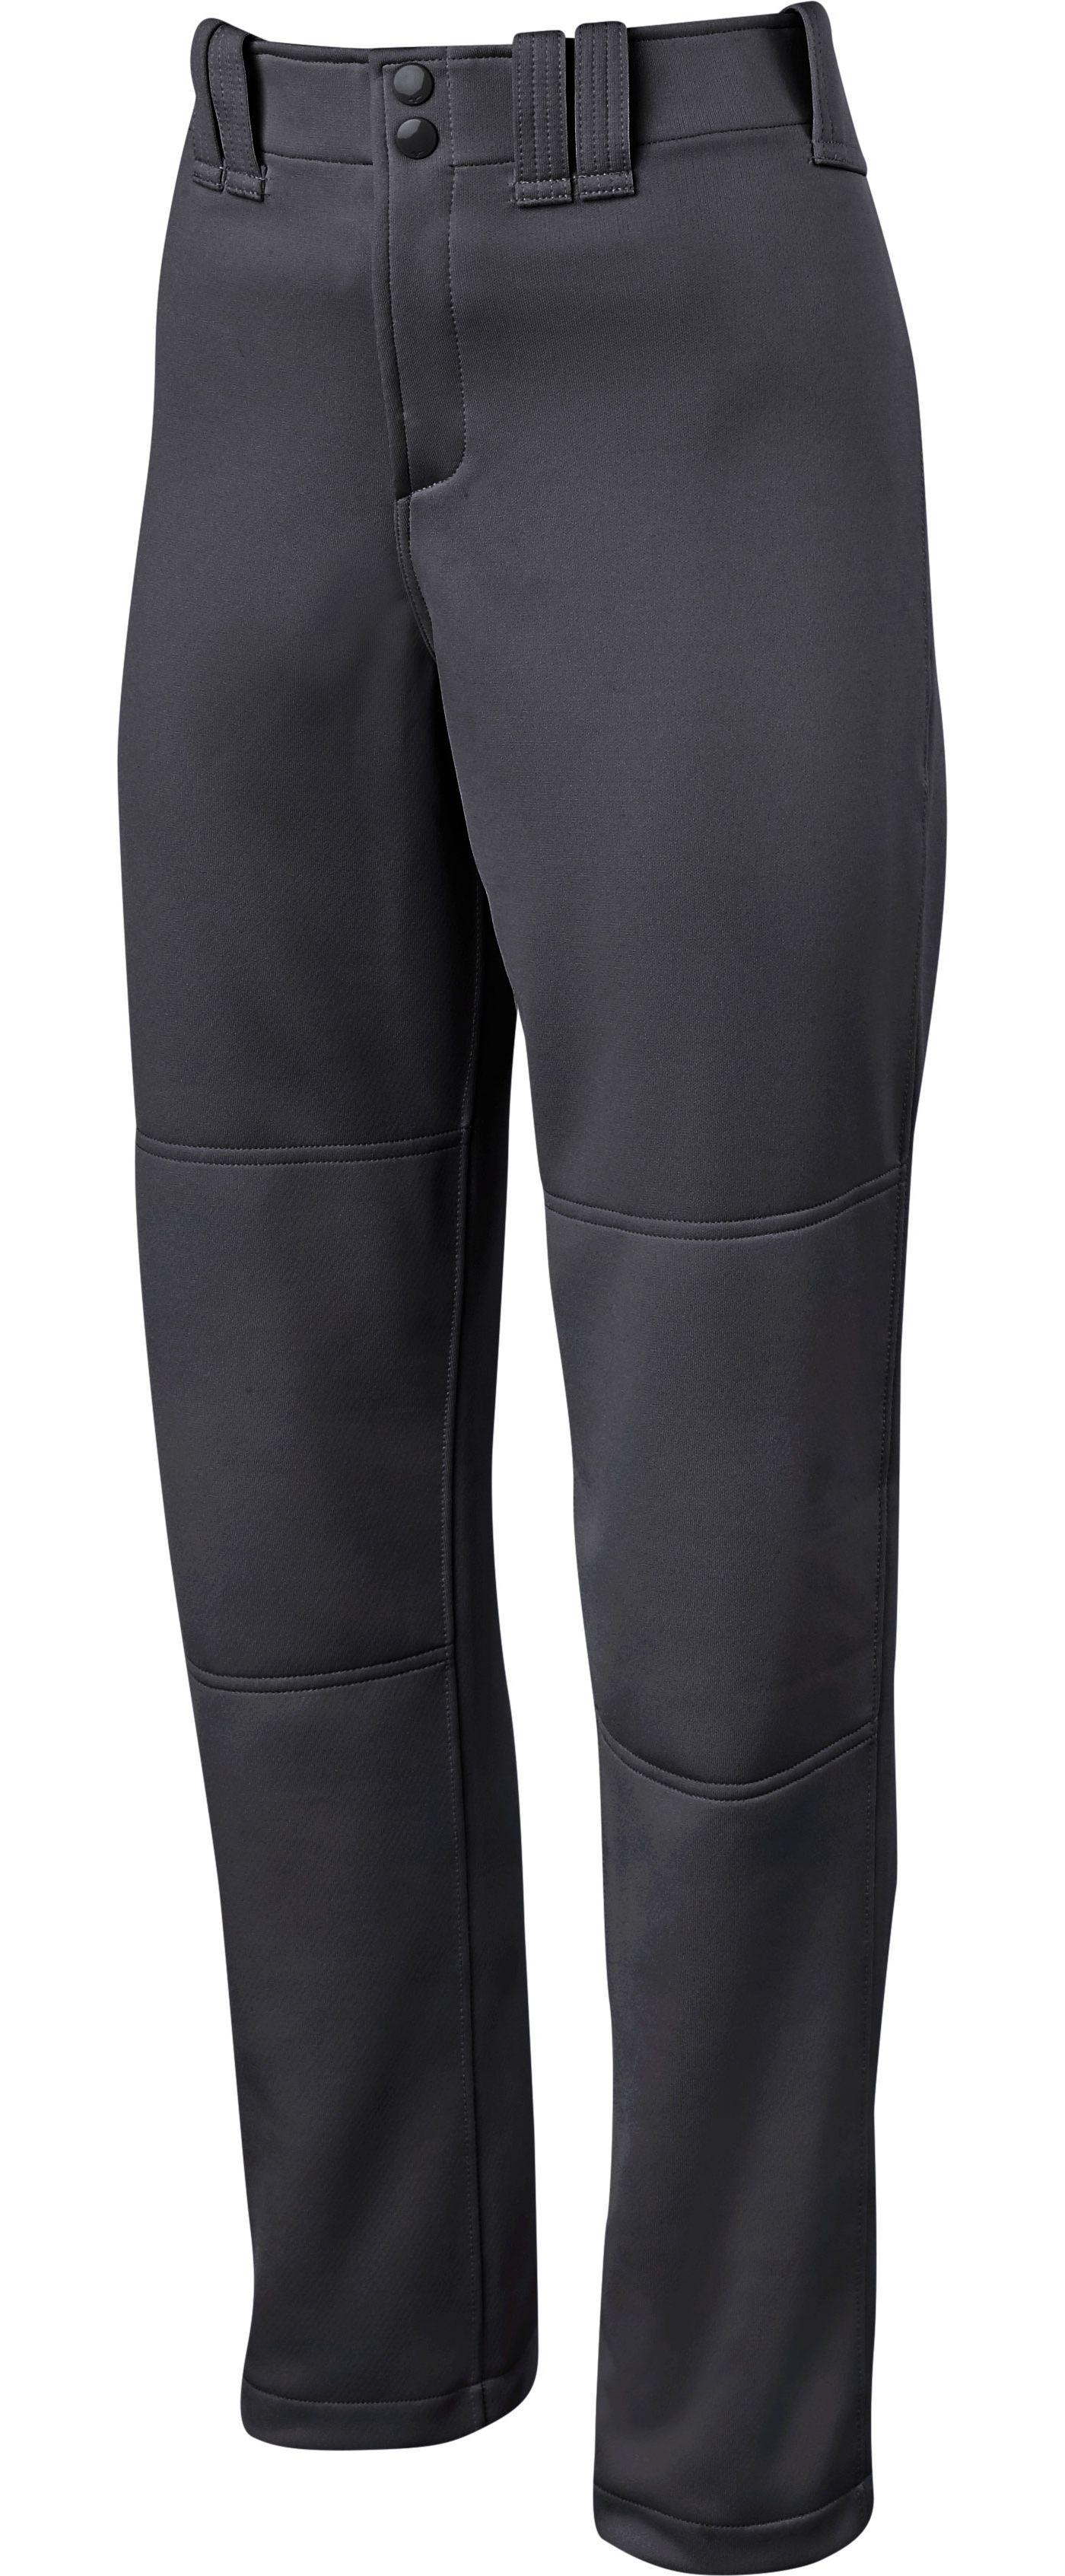 Mizuno Women's Full Length Fastpitch Pants